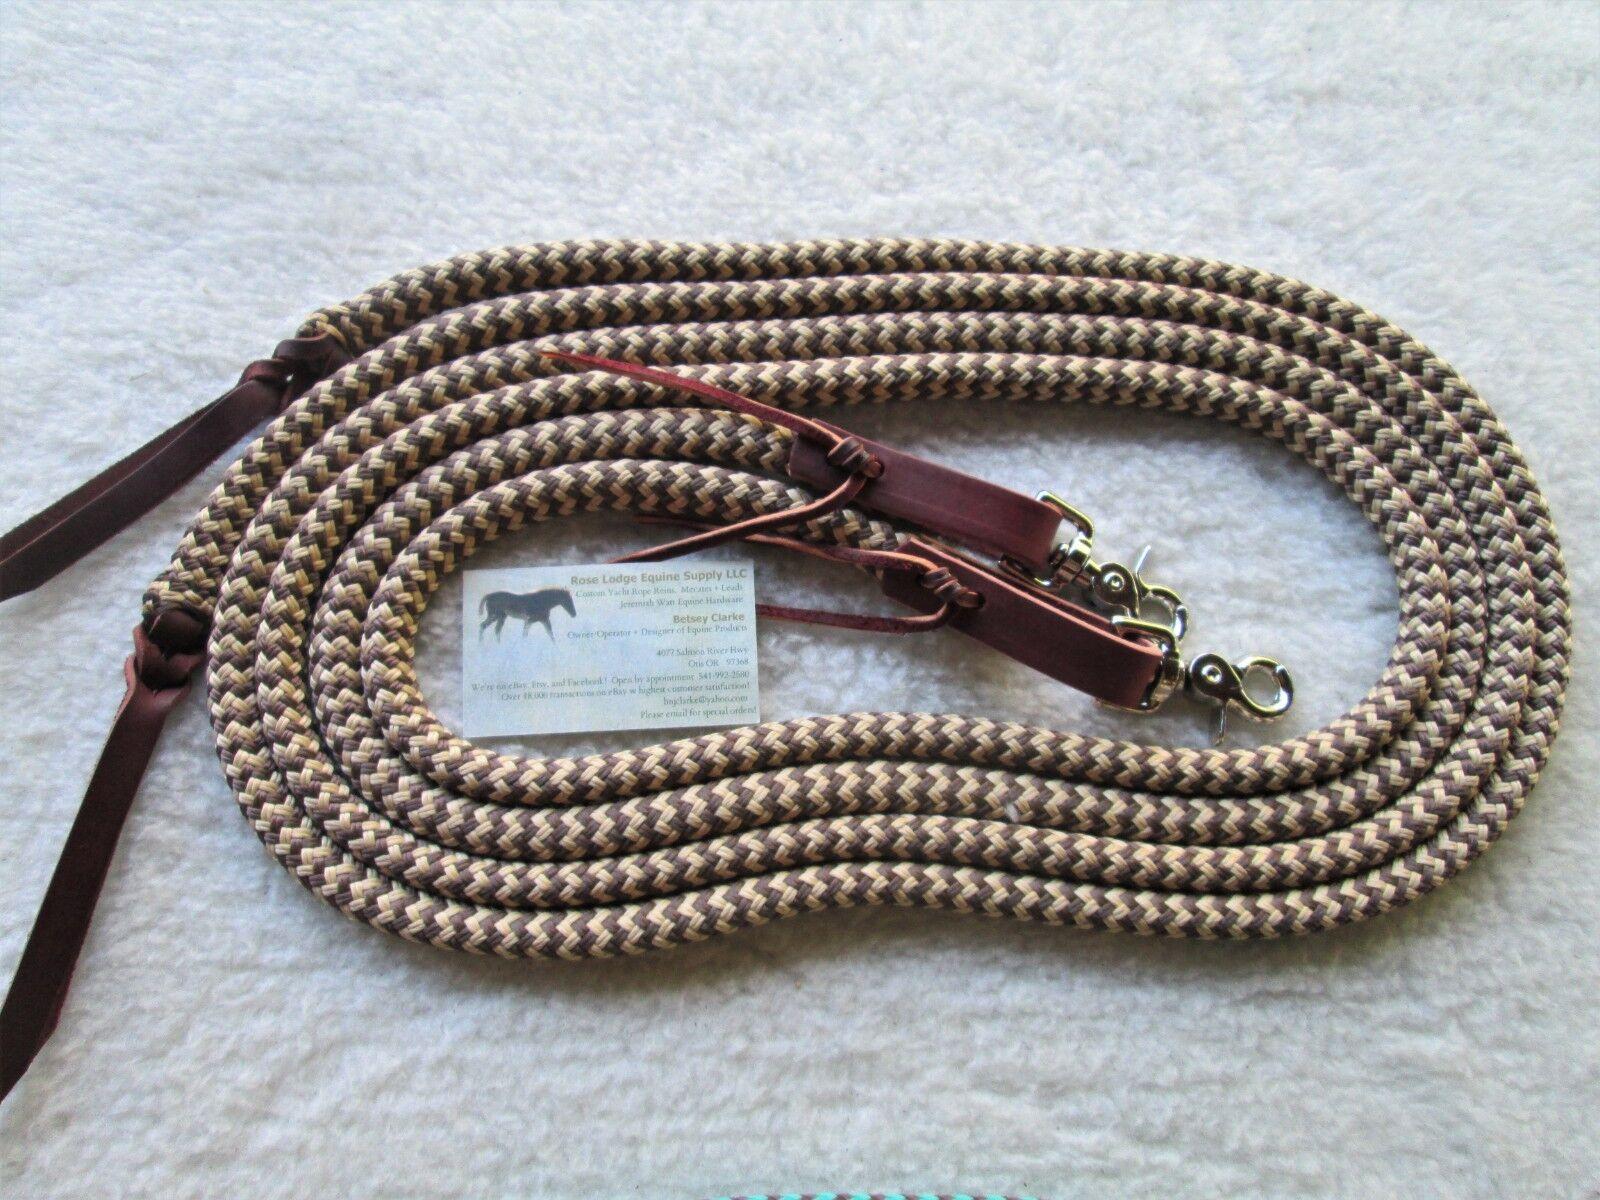 Tan   Brown Yacht Rope SPLIT Reins w Leathers, Snaps 7' x 1 2 Snakeskin Pattern